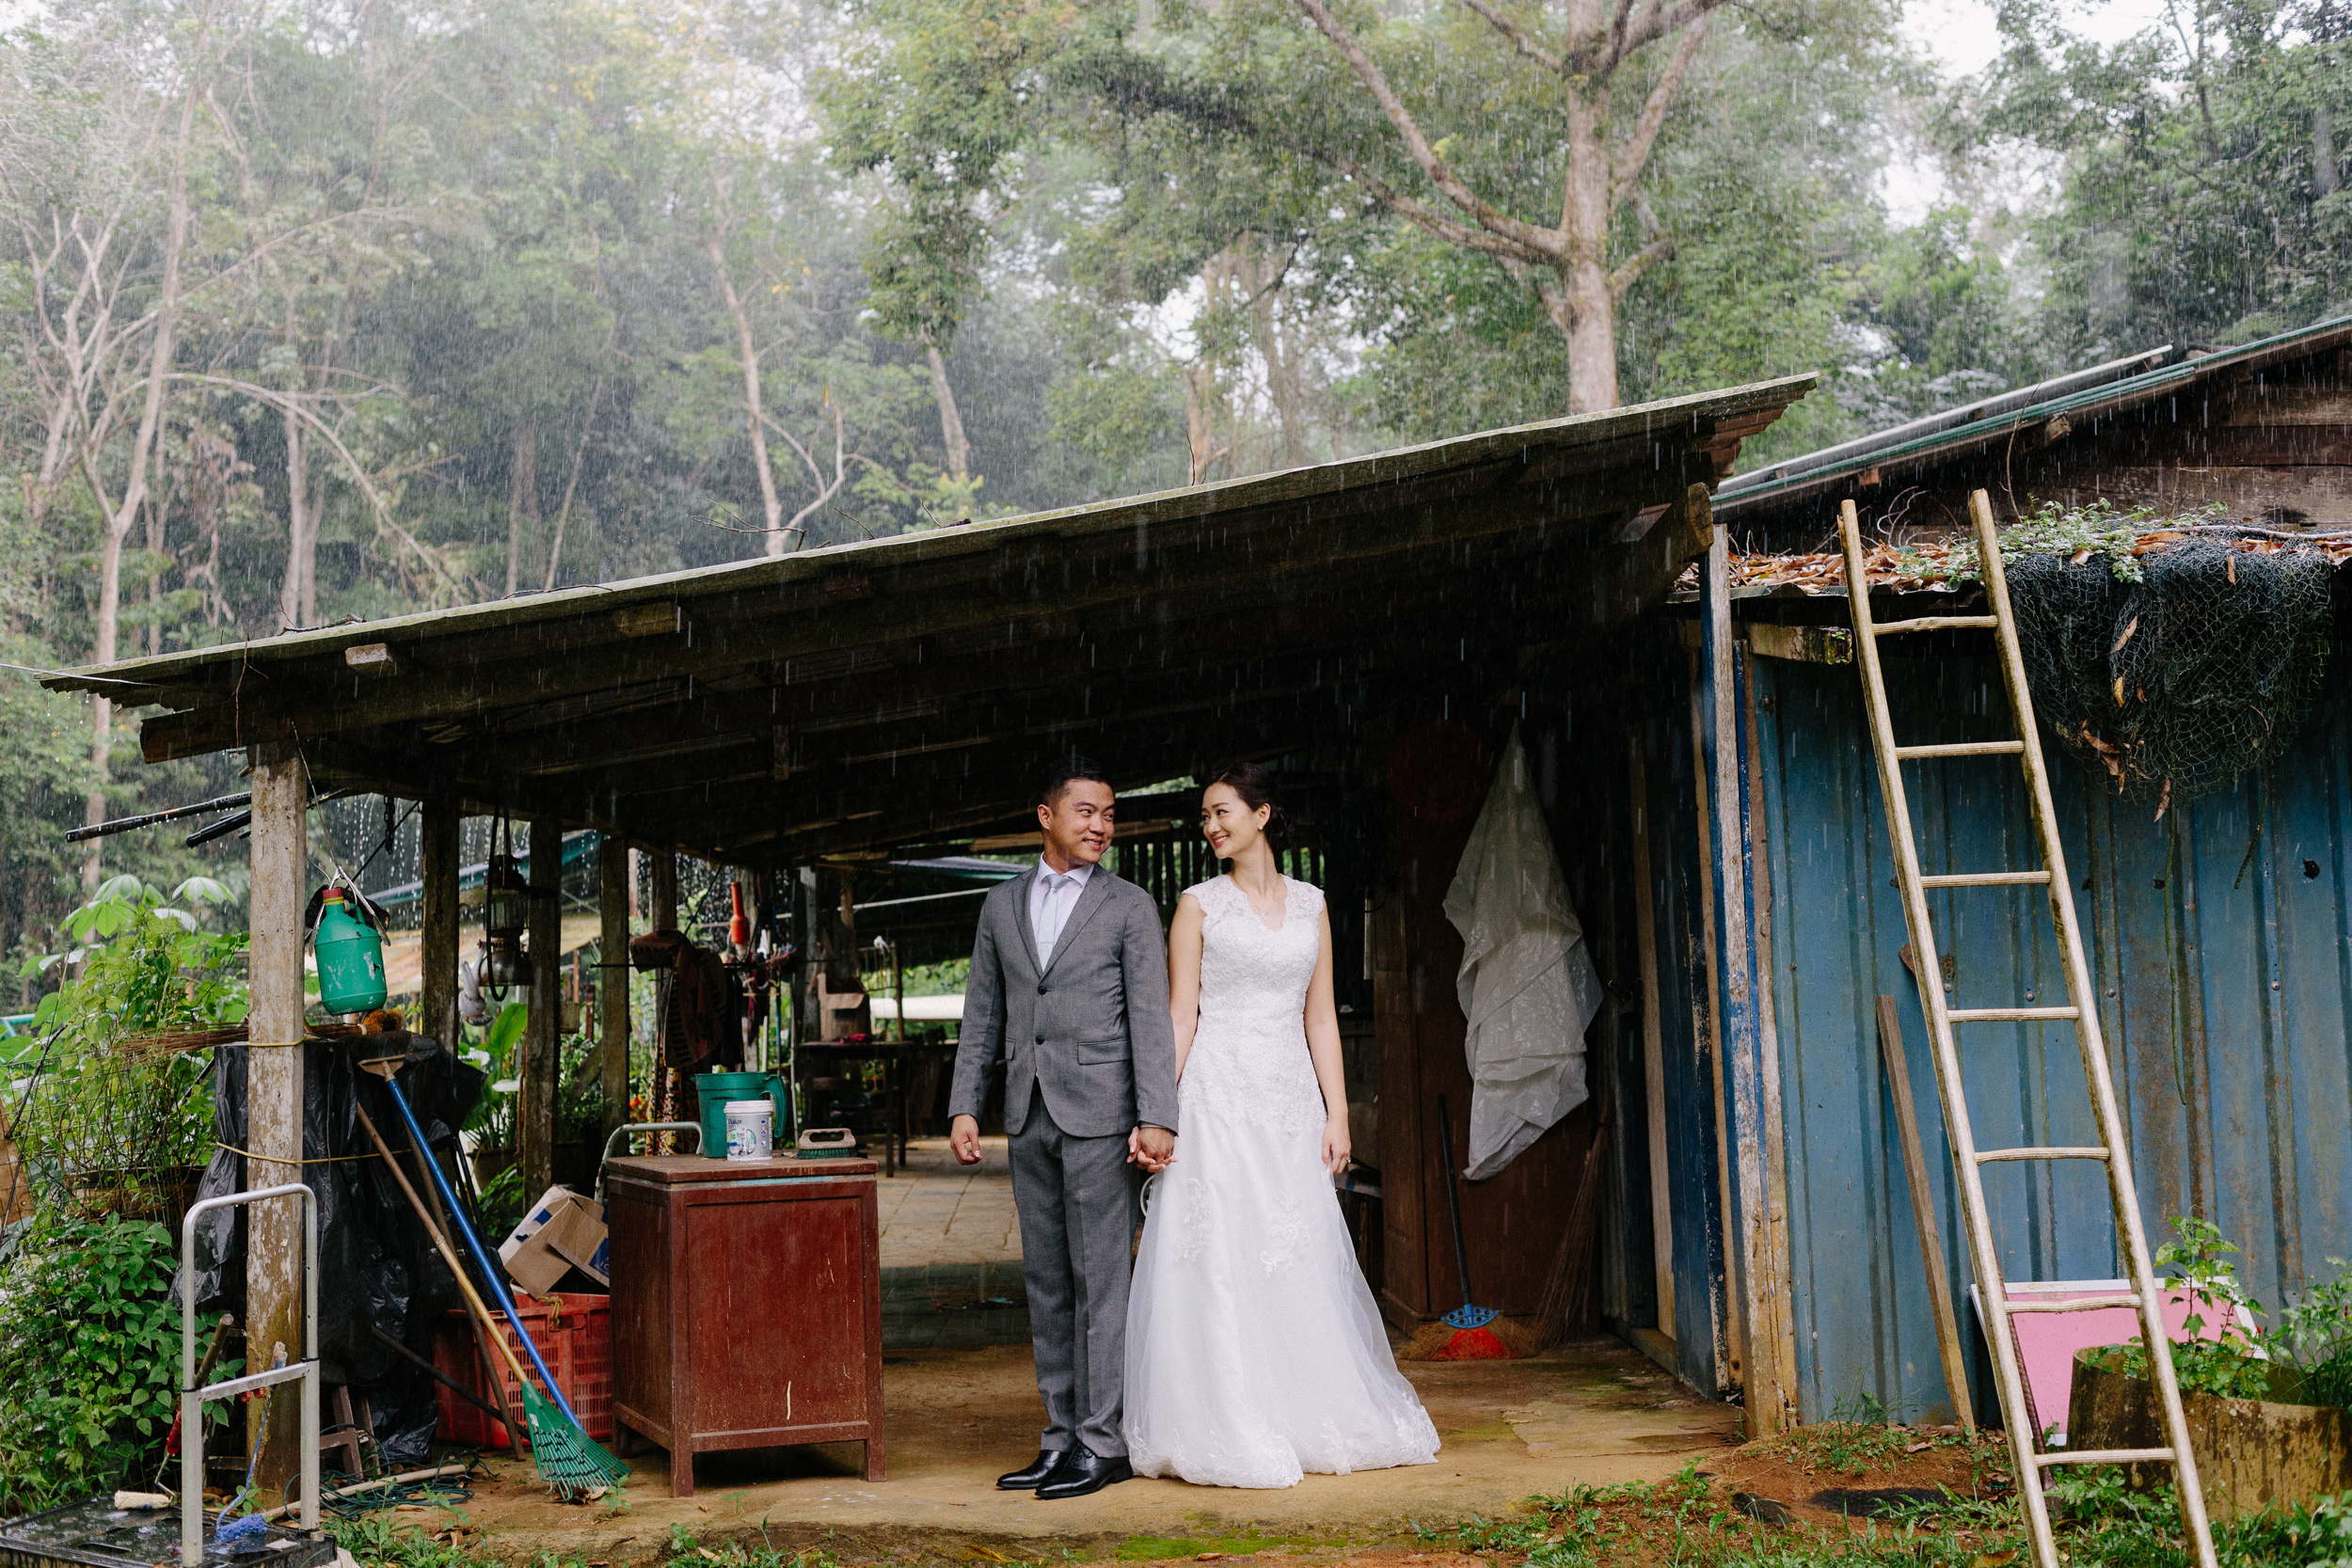 singapore-wedding-photographer-wemadethese-junekit-kingslin-09.jpg